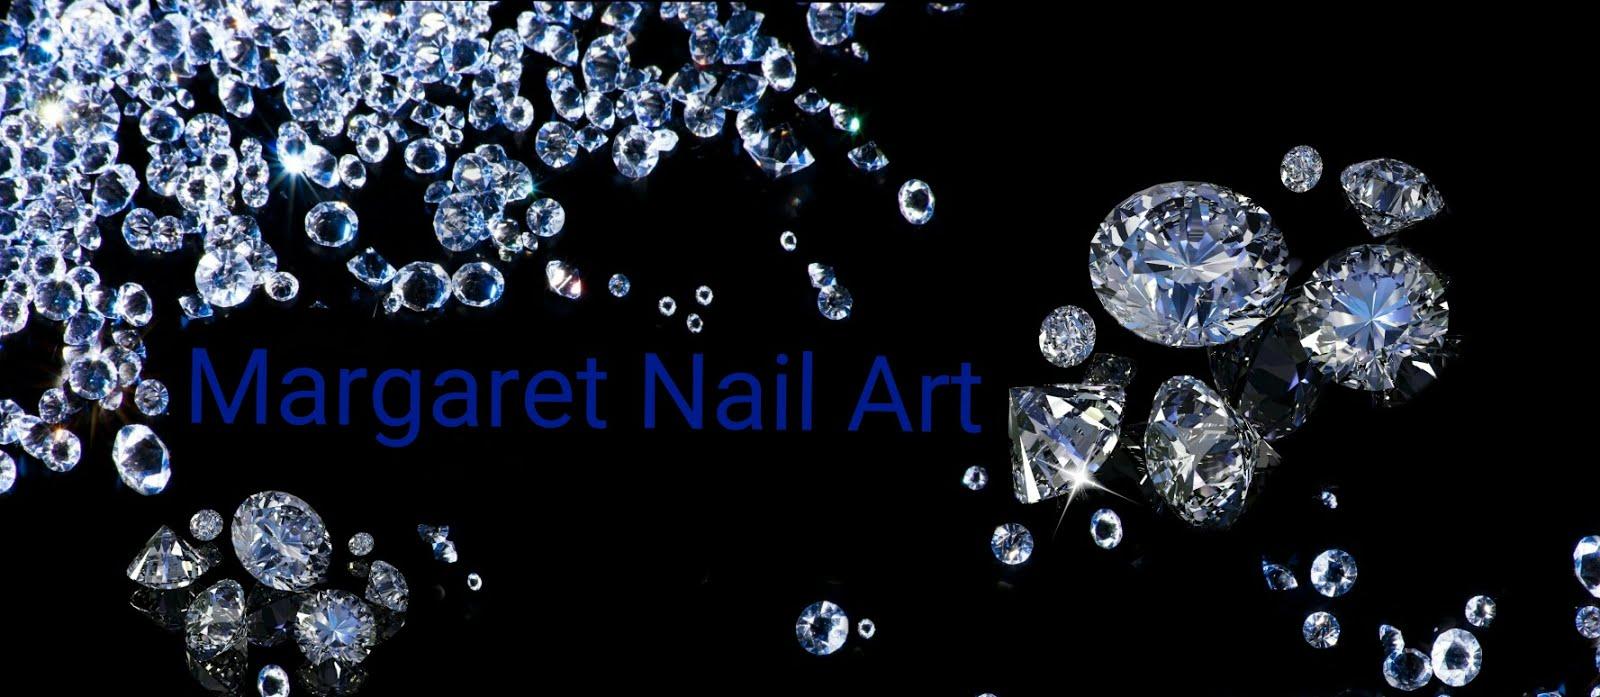 Margaret Nail Art